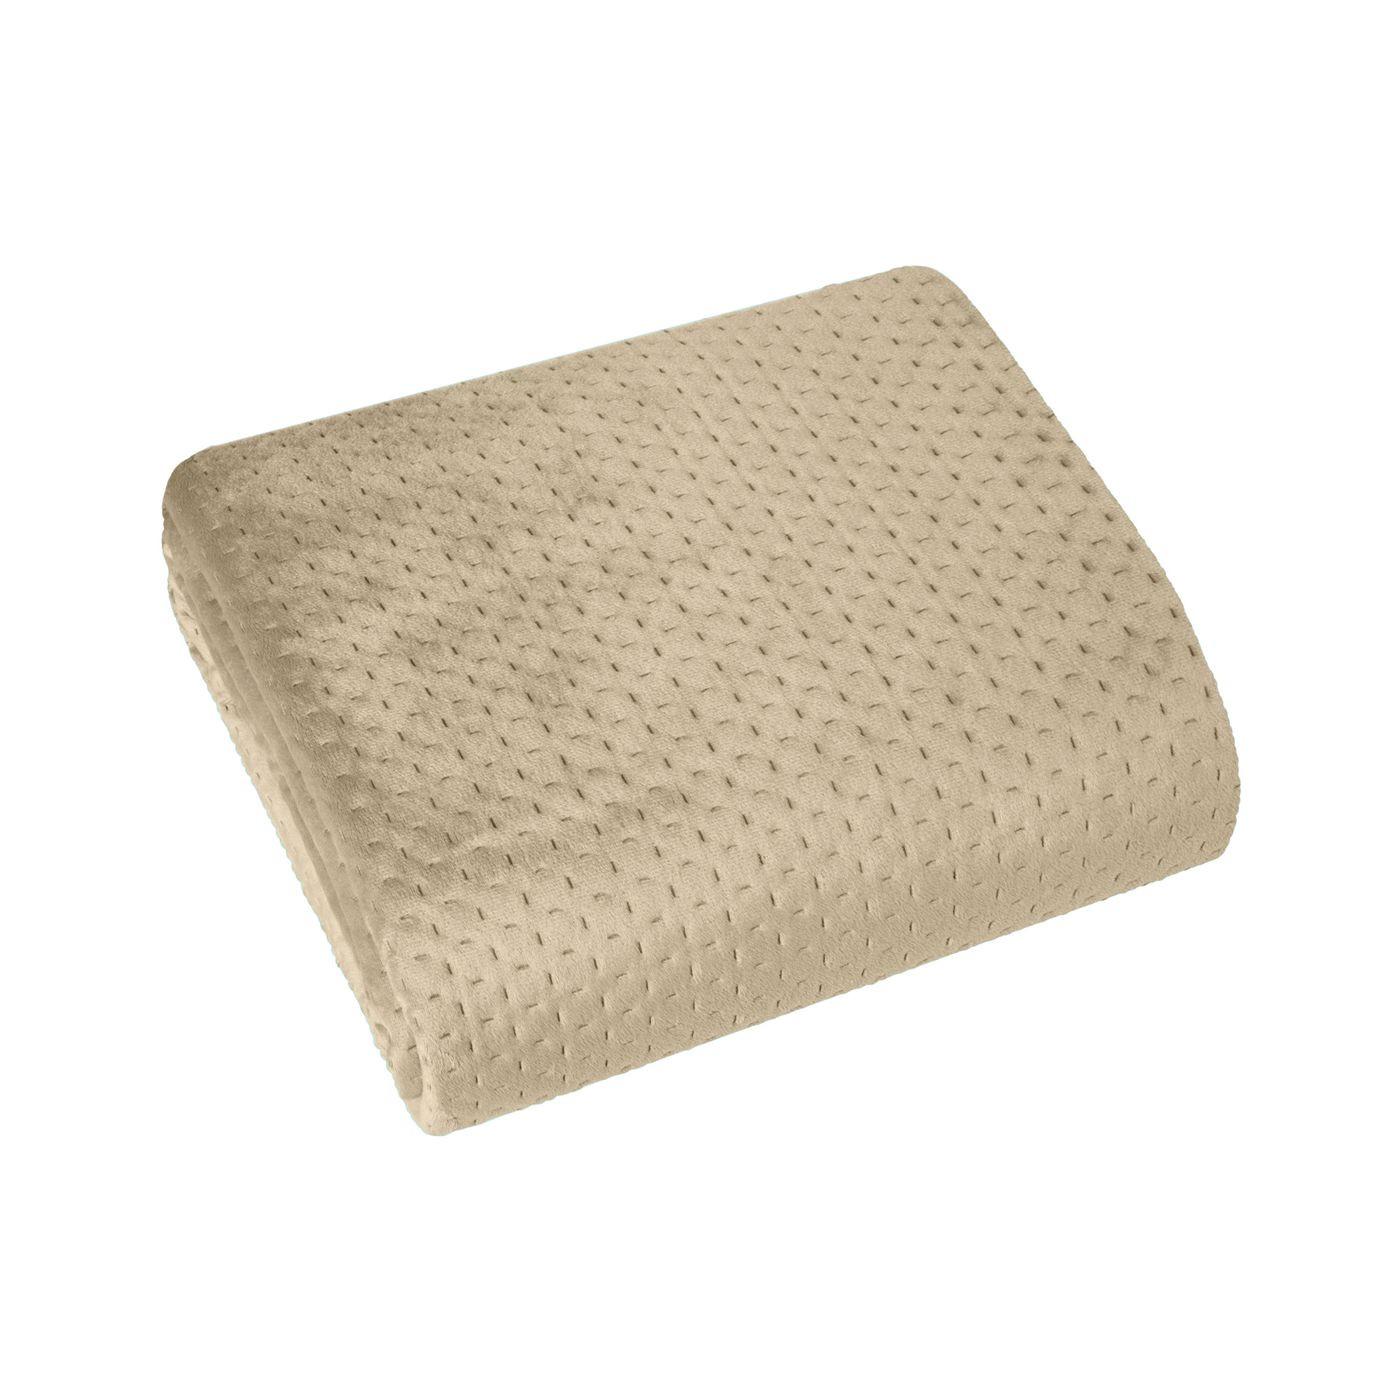 Narzuta na łóżko welwetowa pikowana hotpress 200x220 cm beżowa